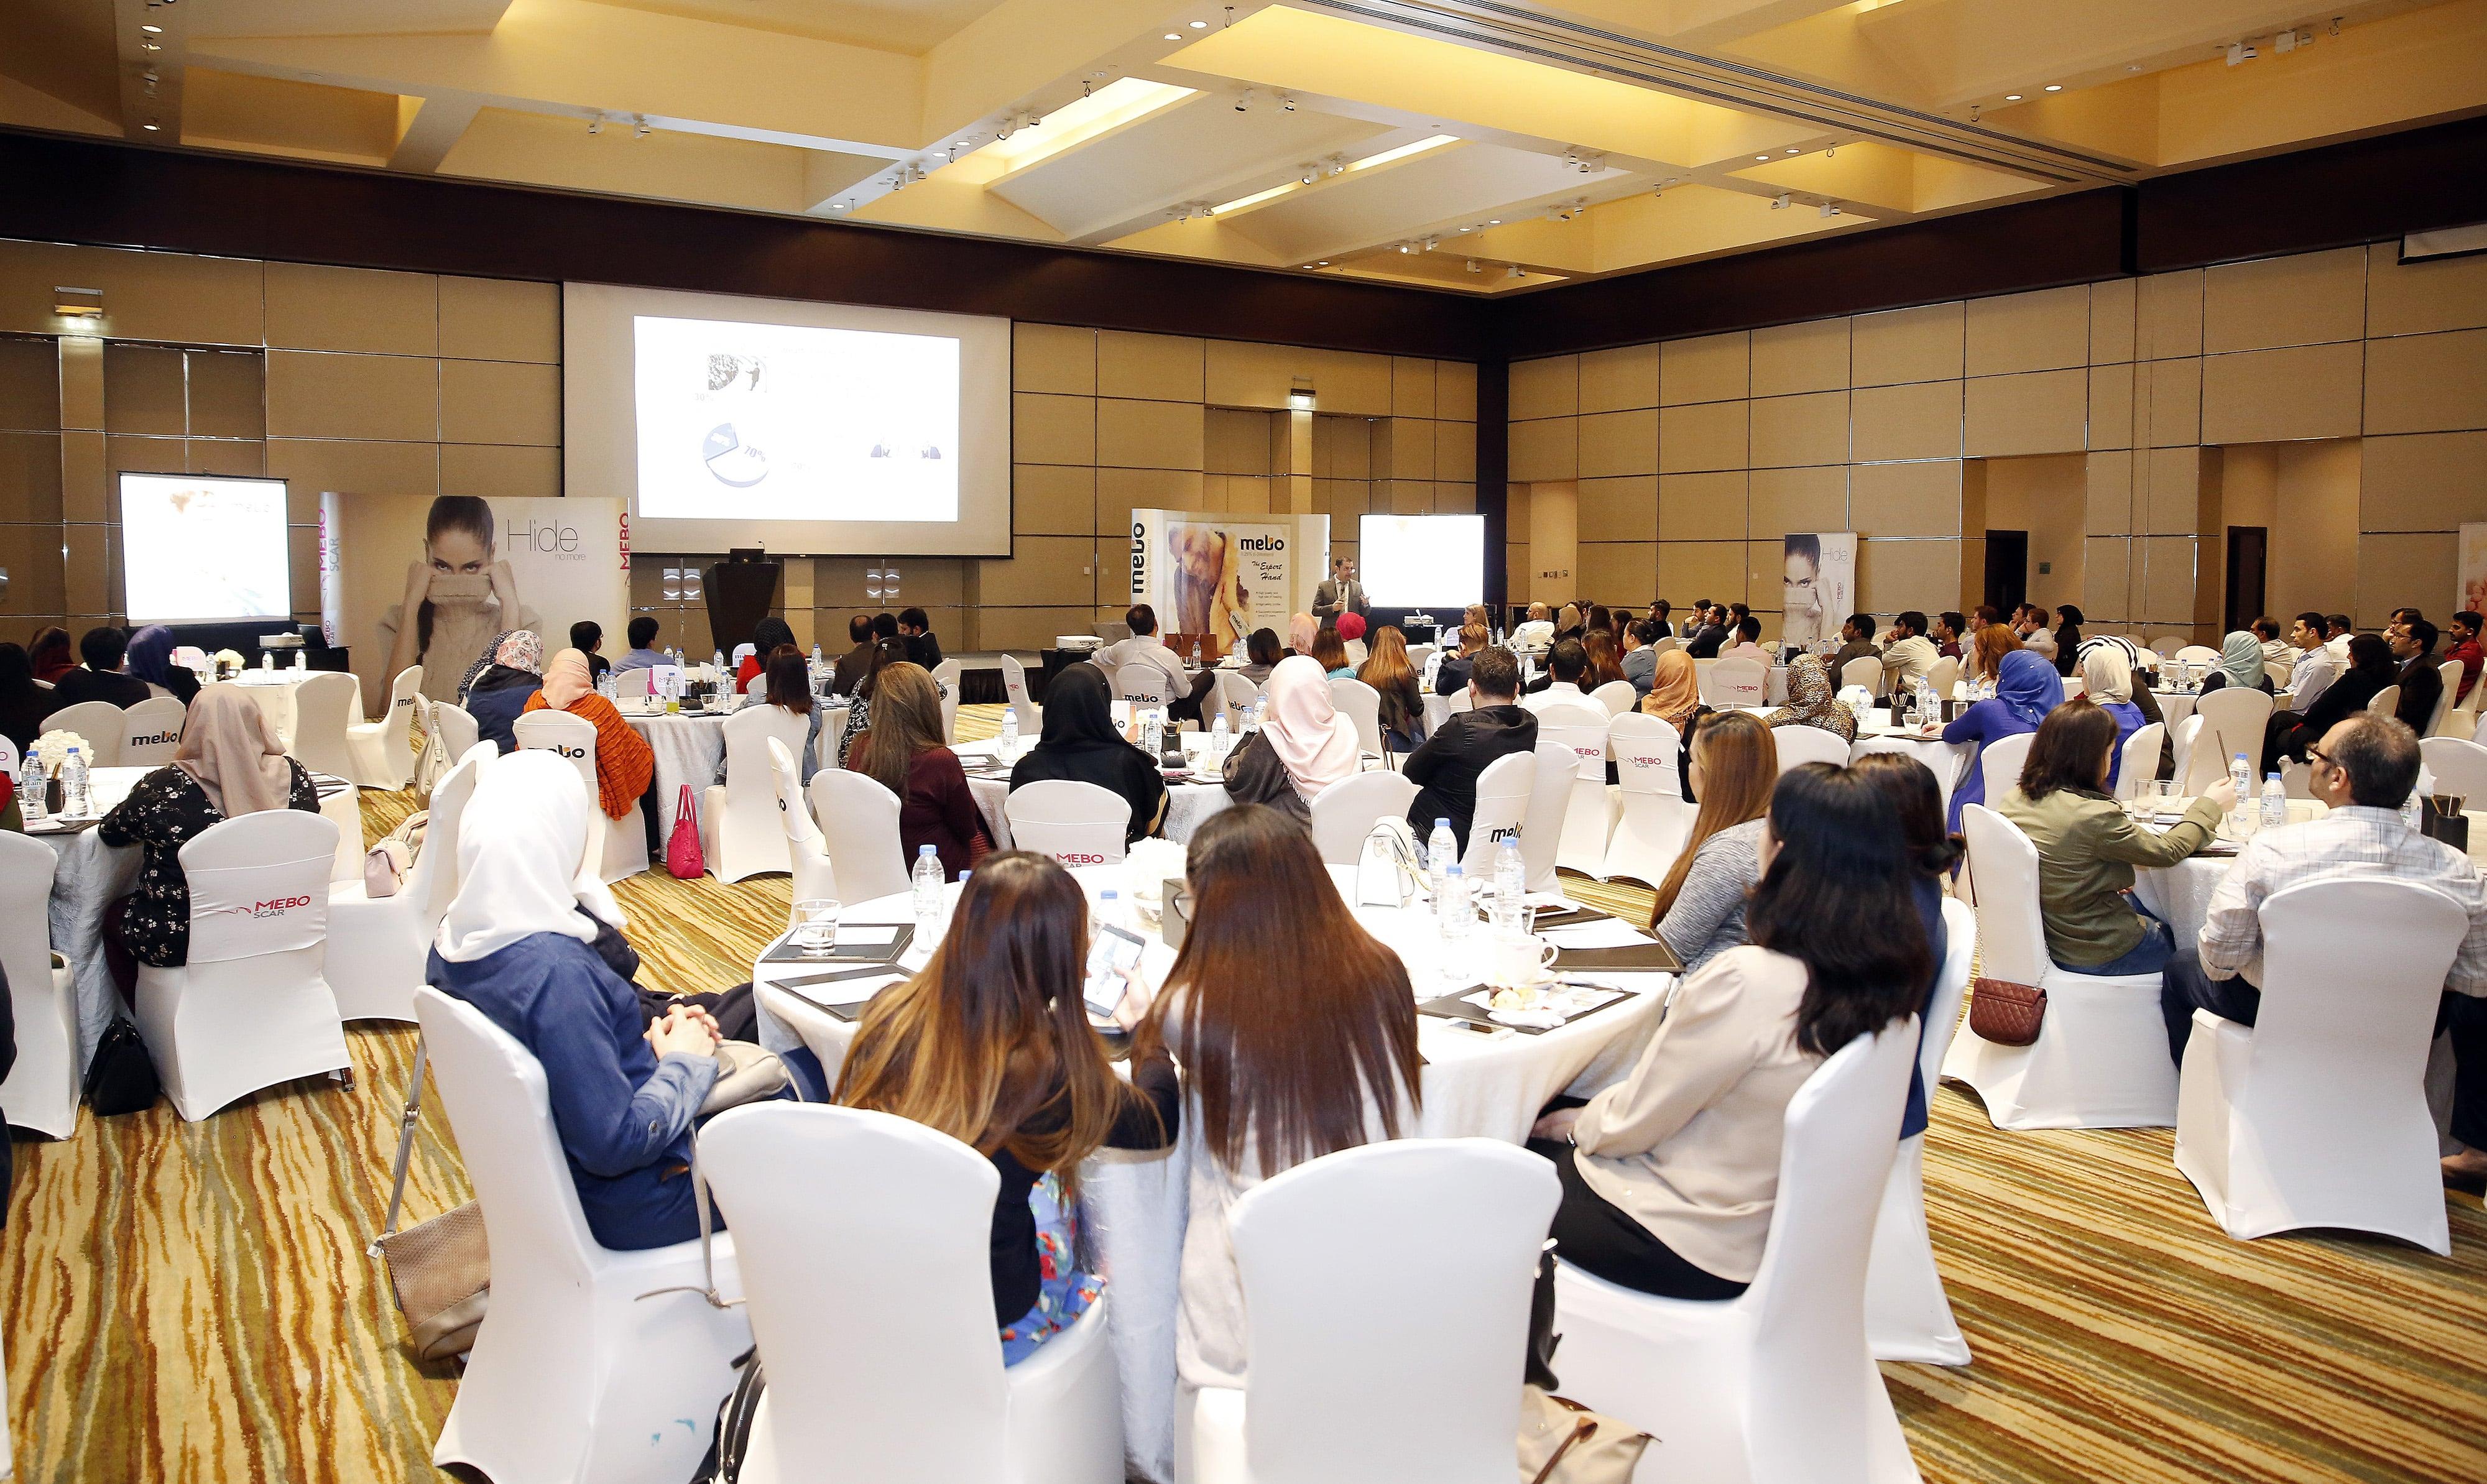 Julphar hosts a MEBO and MEBO Scar workshop for pharmacists